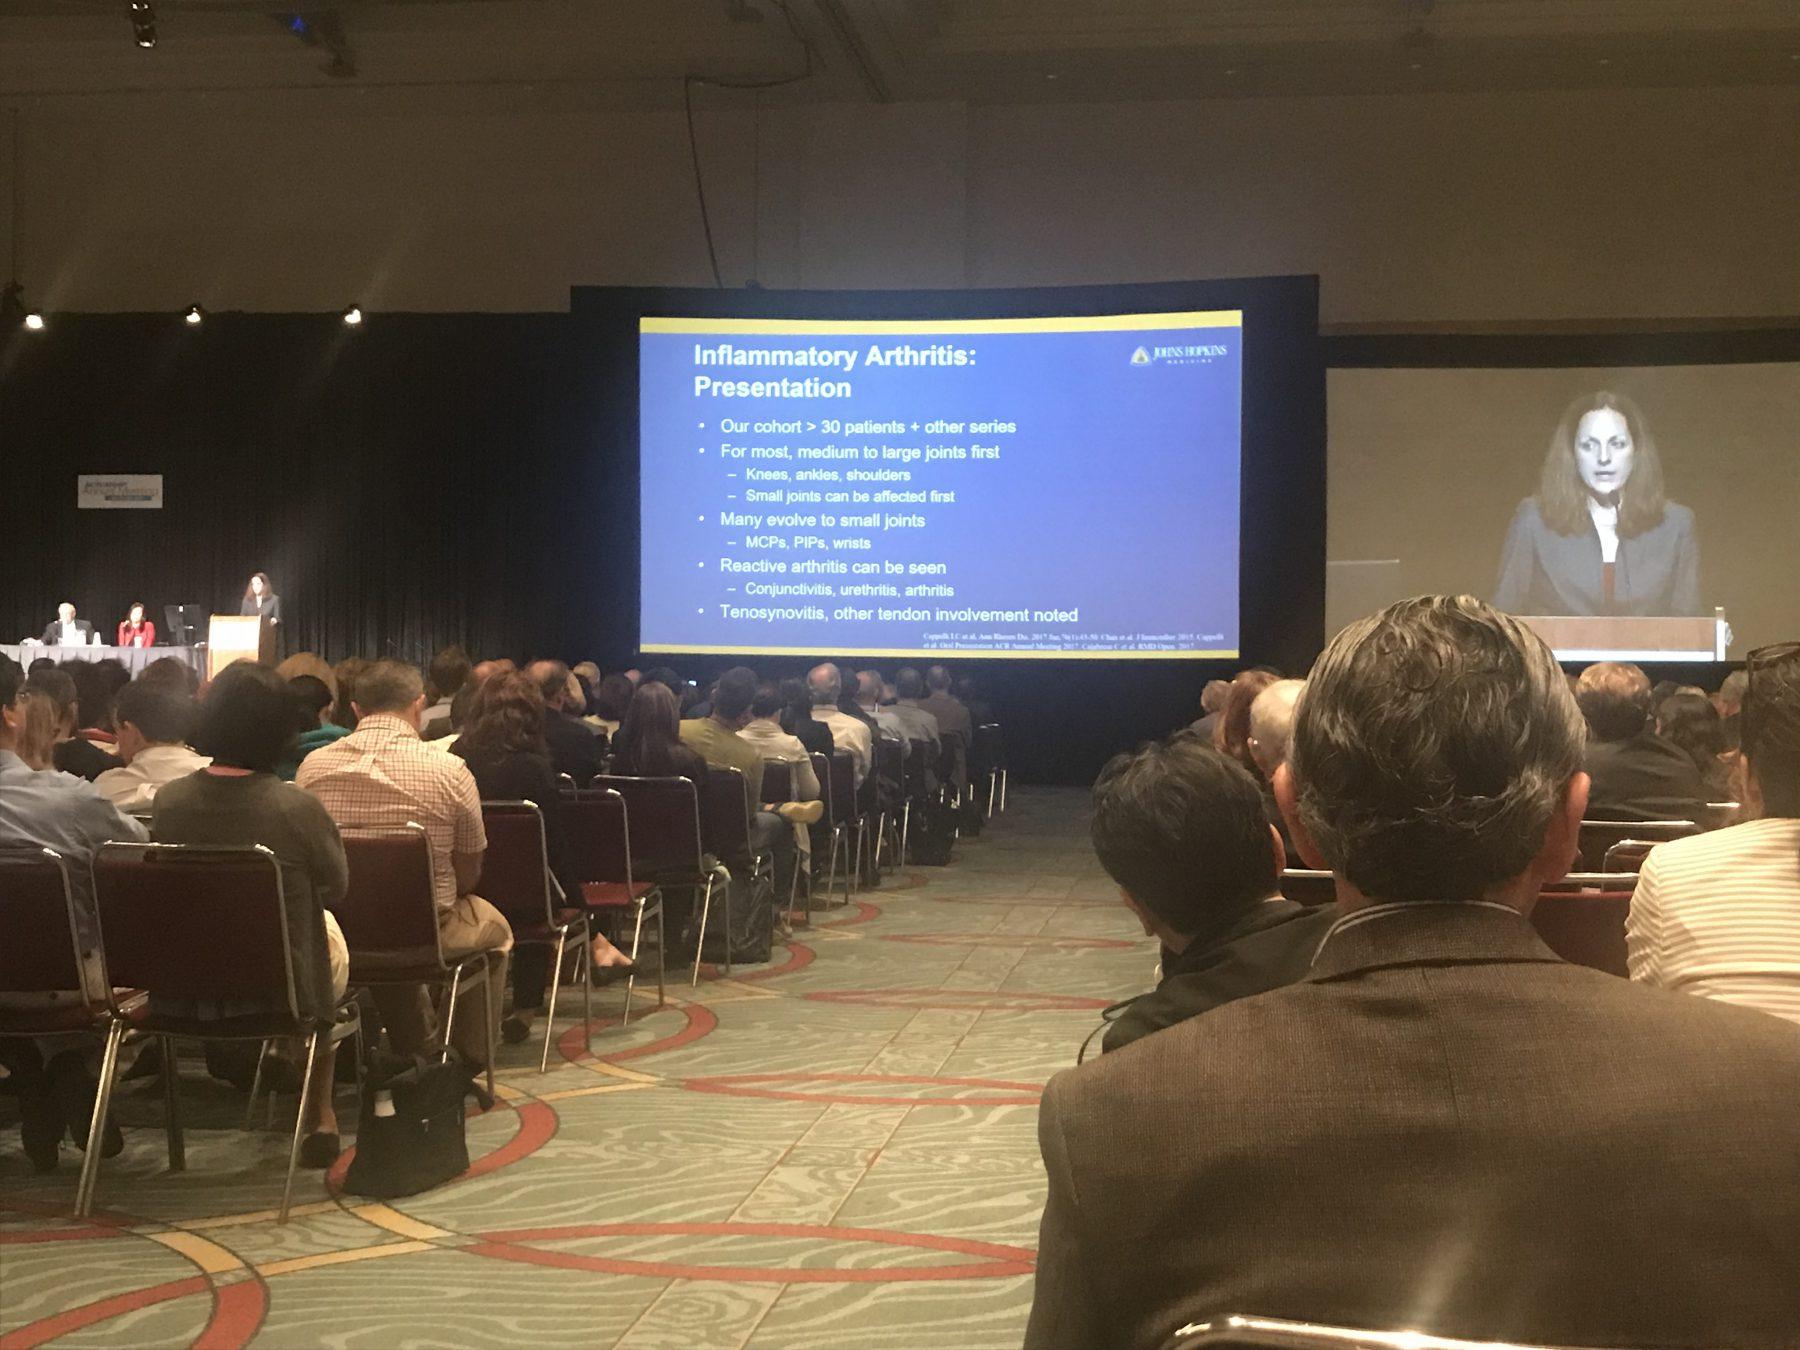 Arthritis Presentation at ACR 17